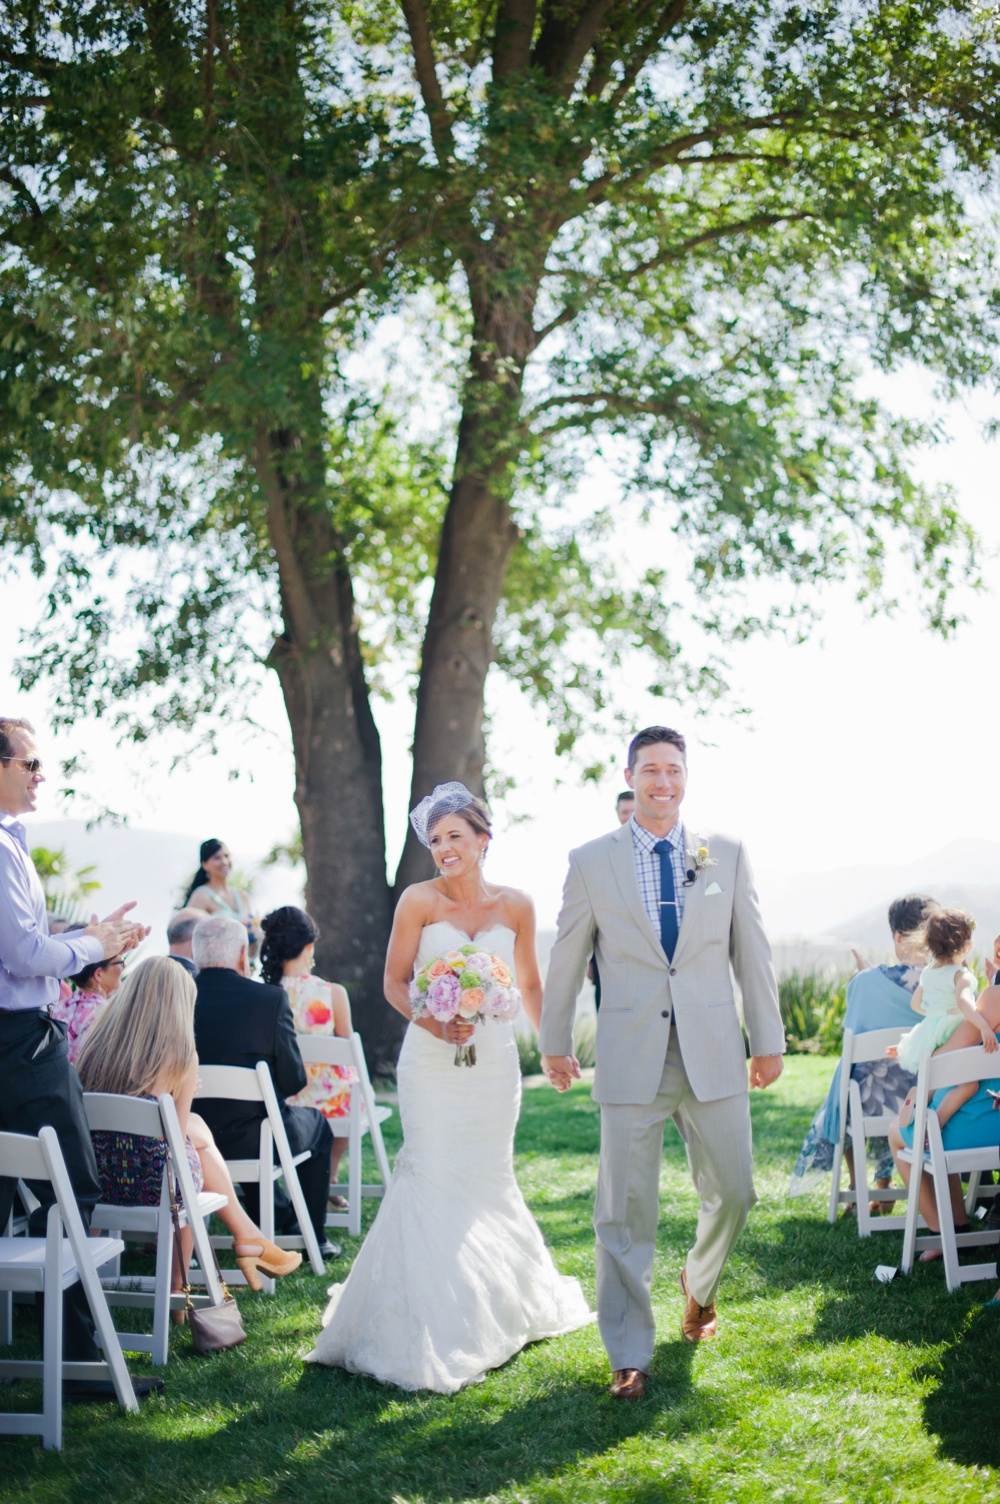 condors_nest_ranch_wedding_photographyL.JPG